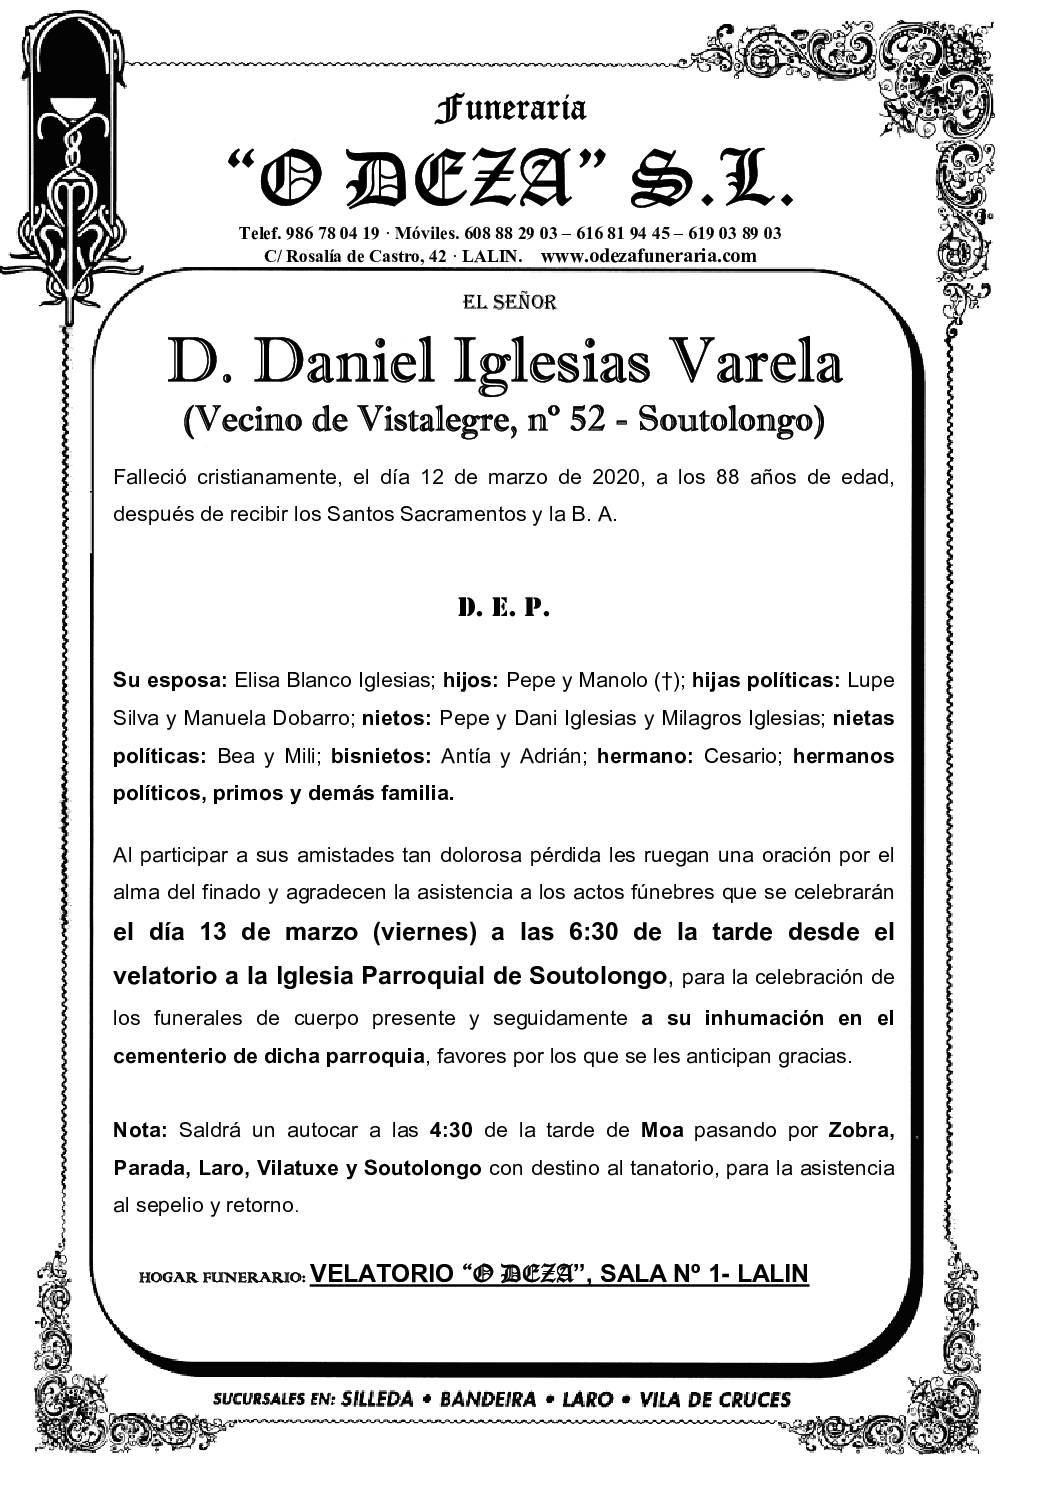 D. DANIEL IGLESIAS VARELA